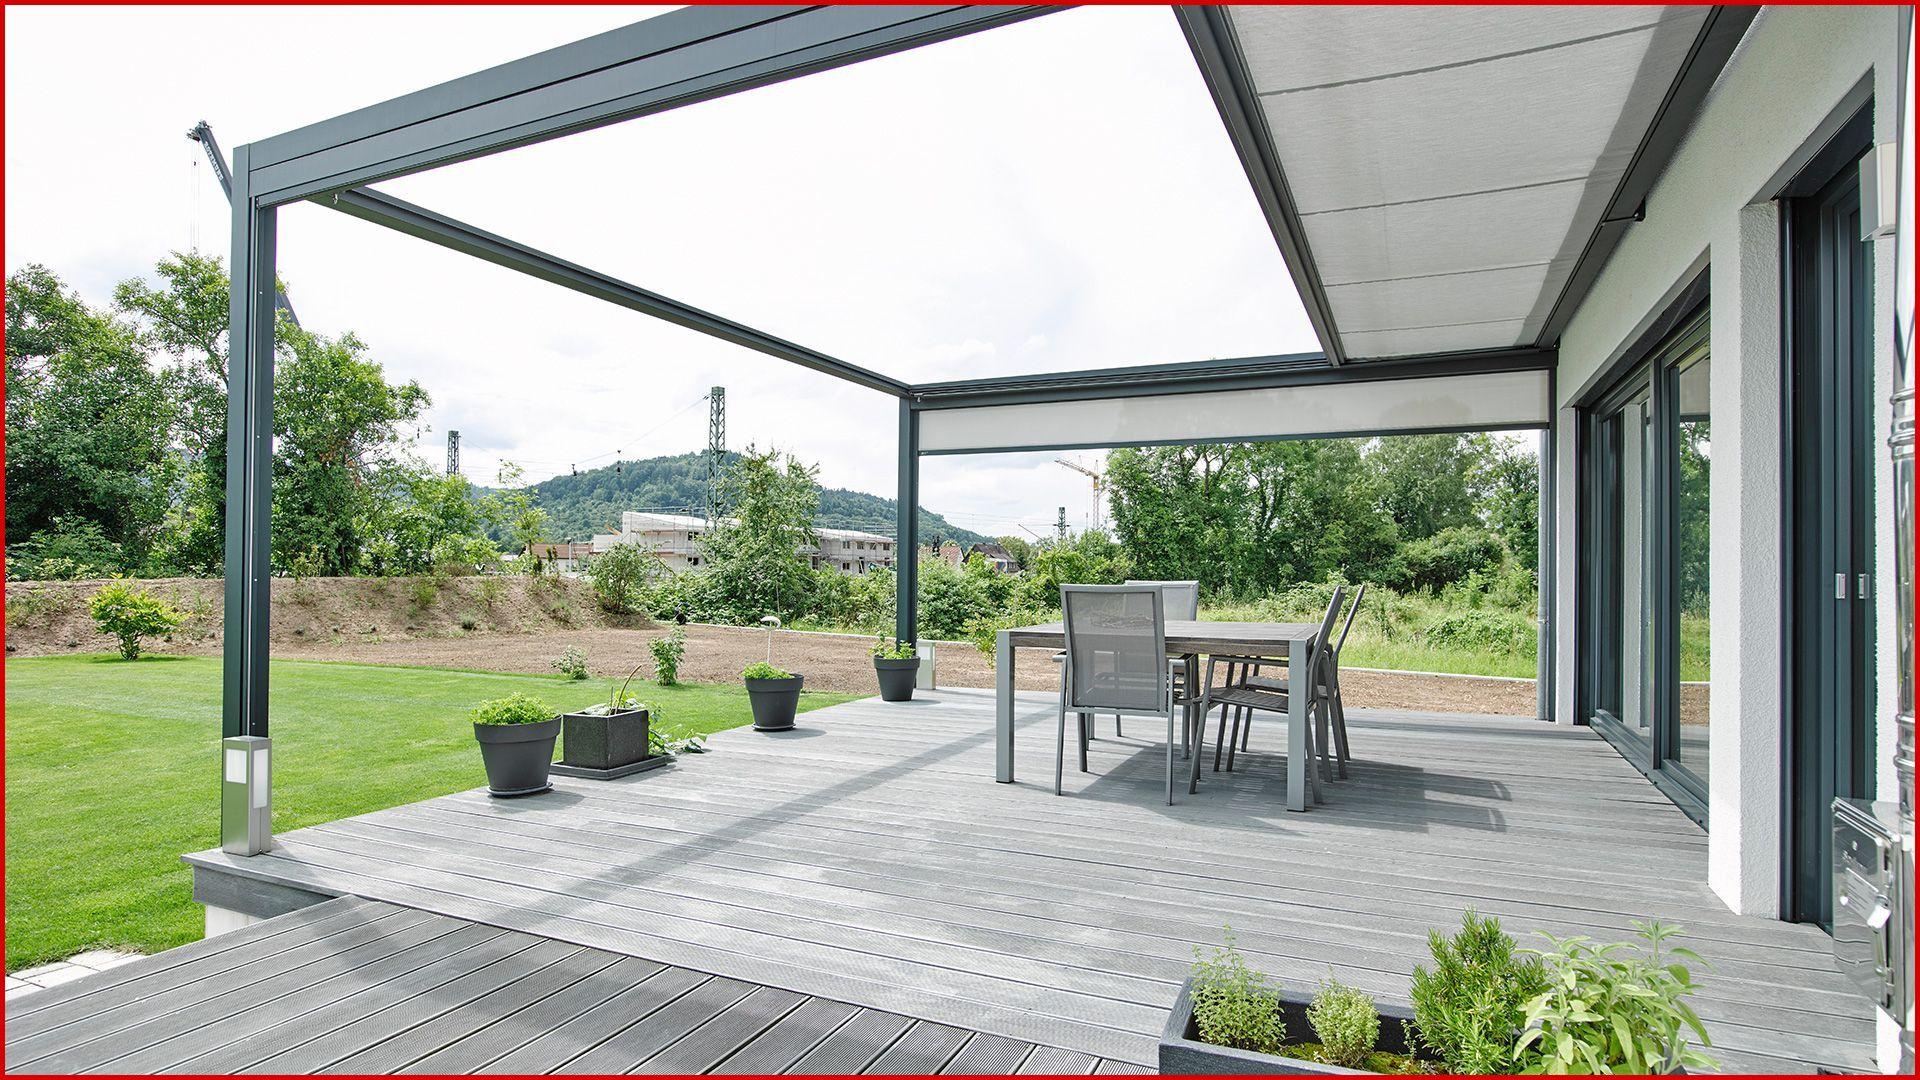 Terrassen sonnenschutz Terrassen sonnenschutz 20 Erstklassige ...